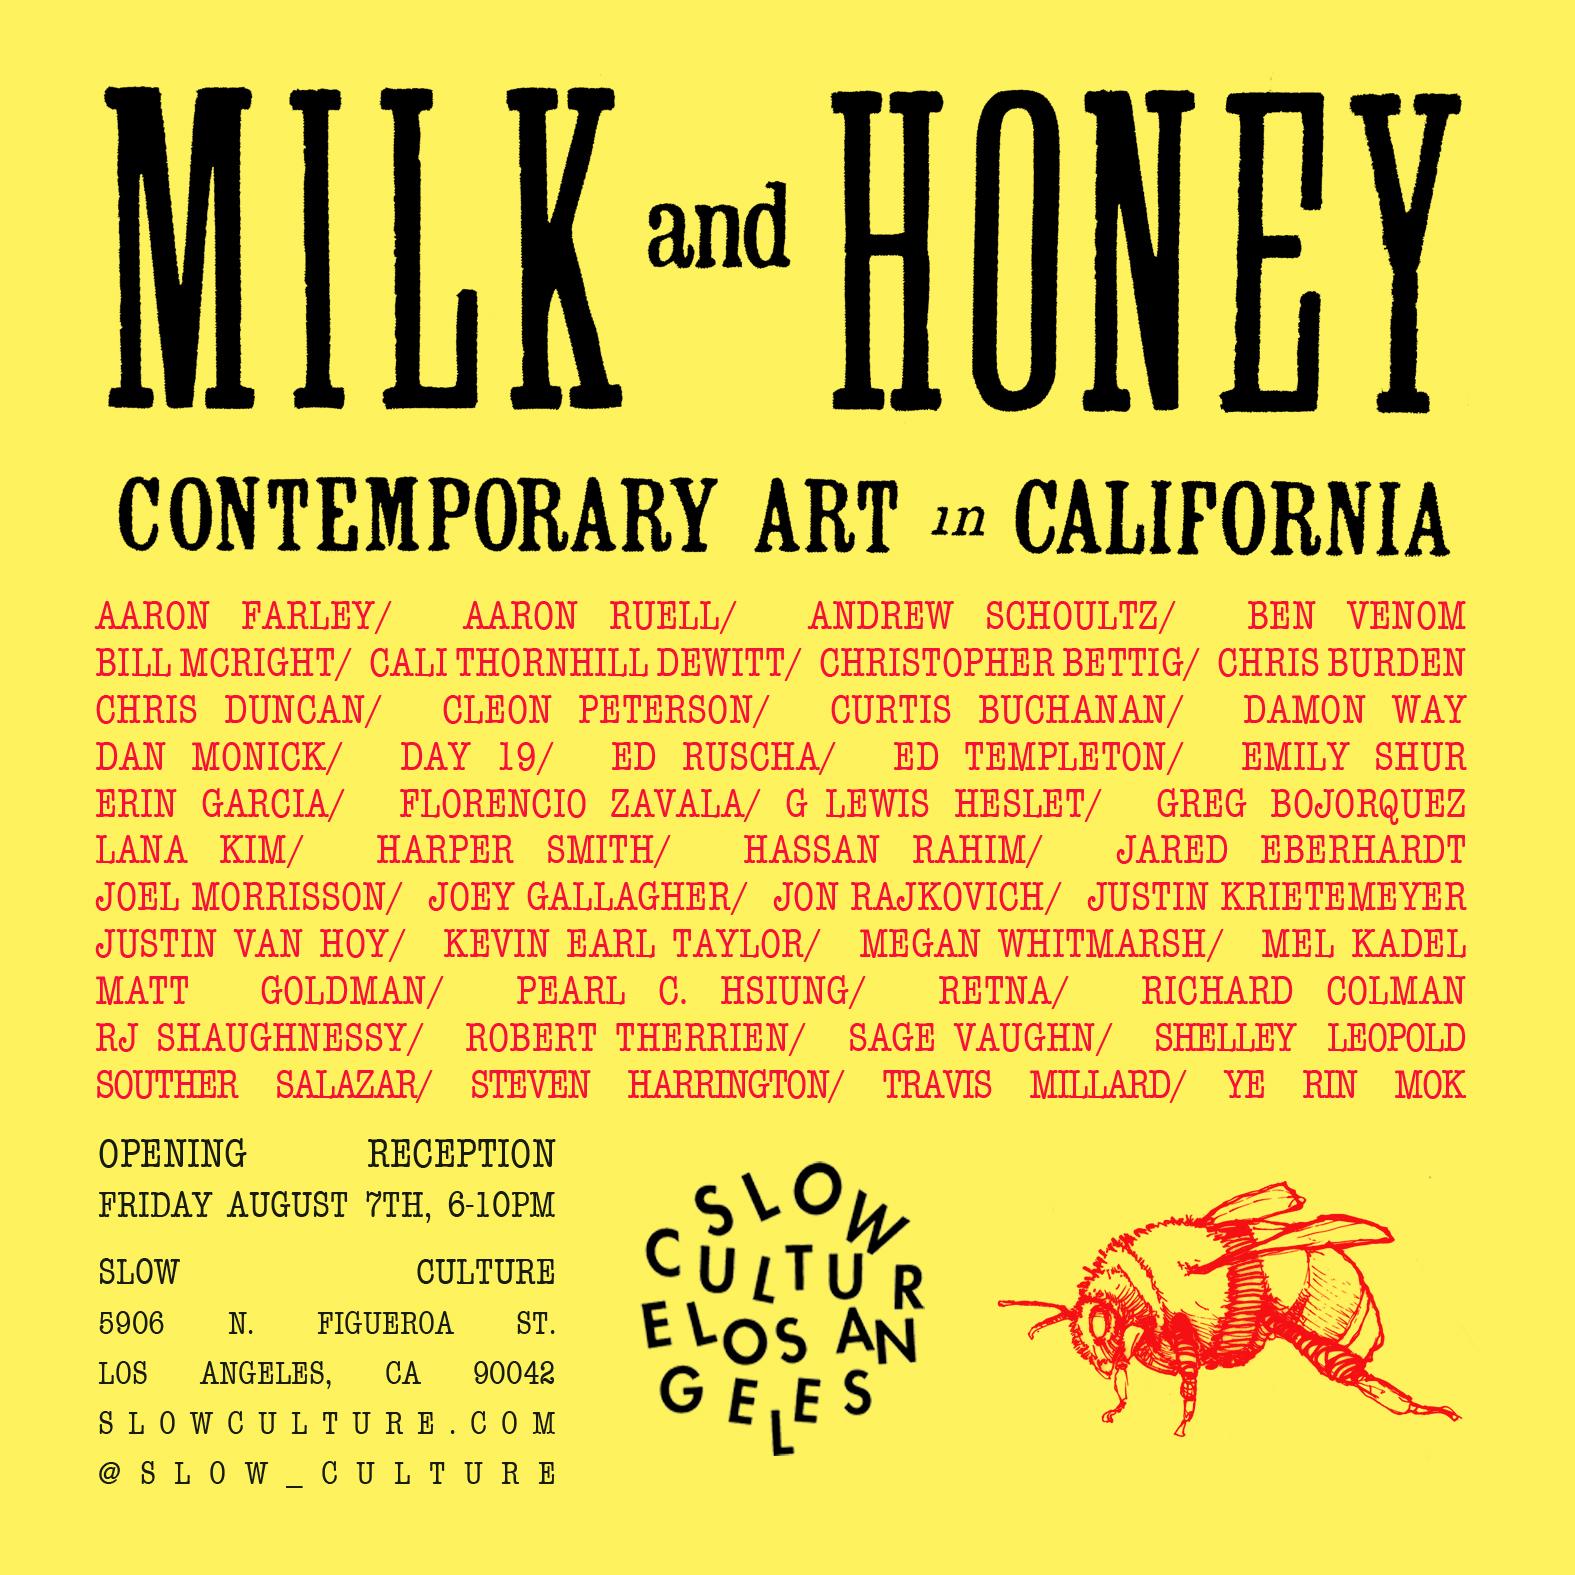 SlowCulture-MilkandHoney-1.jpg